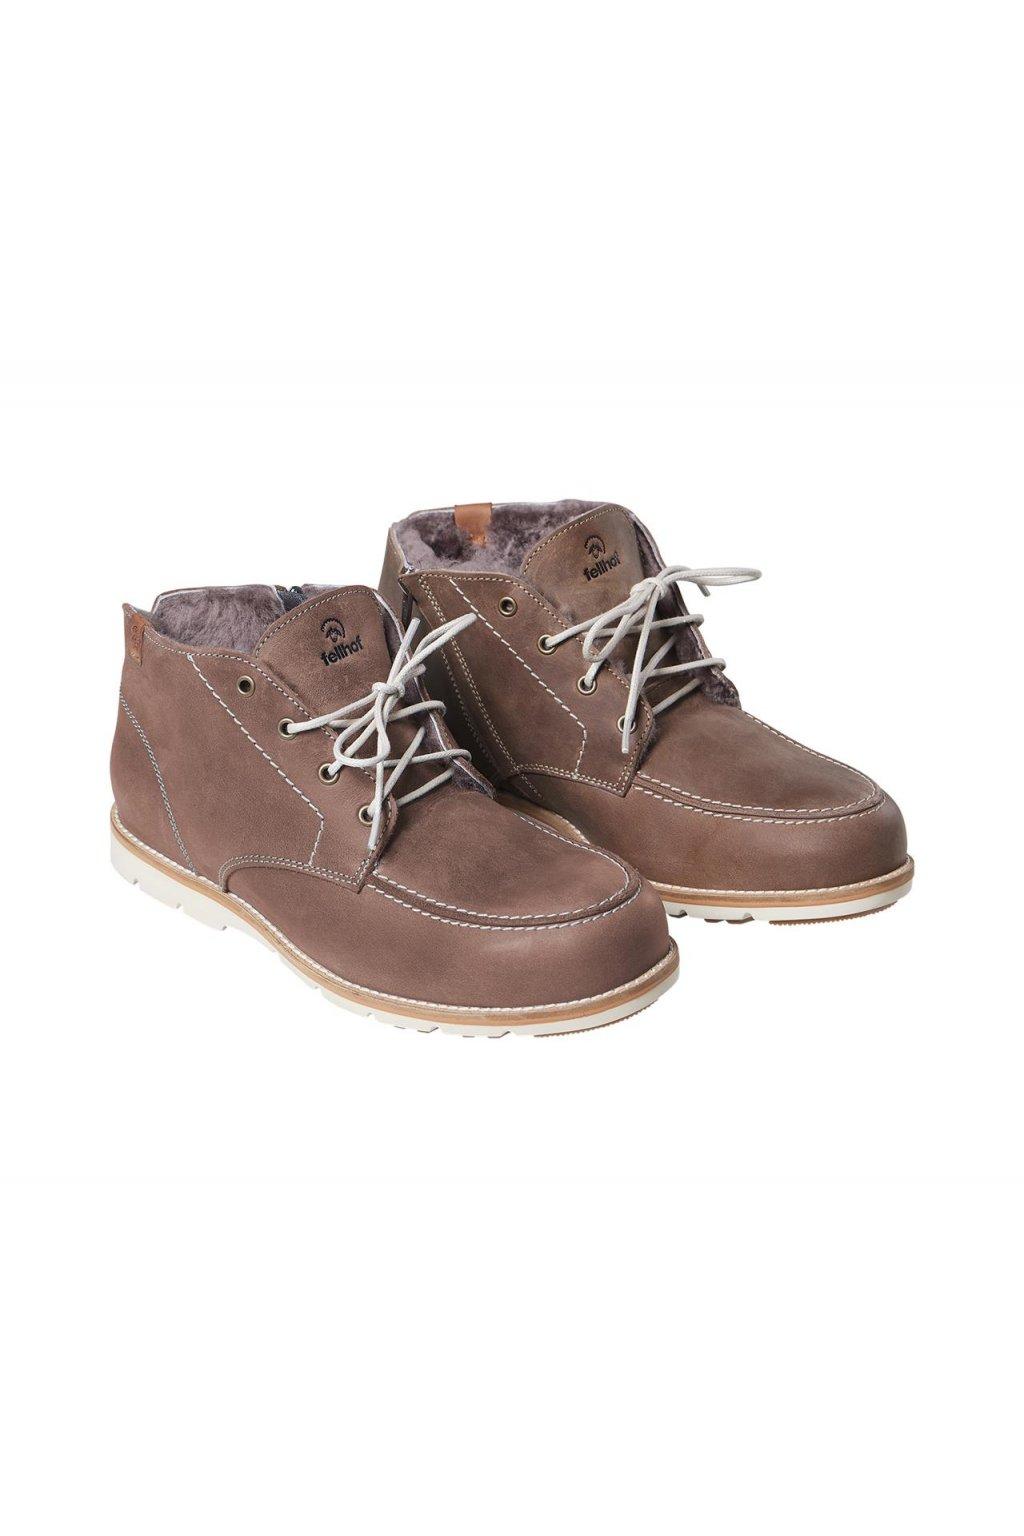 Sneaker Walker braunkeVCWlxvusryC